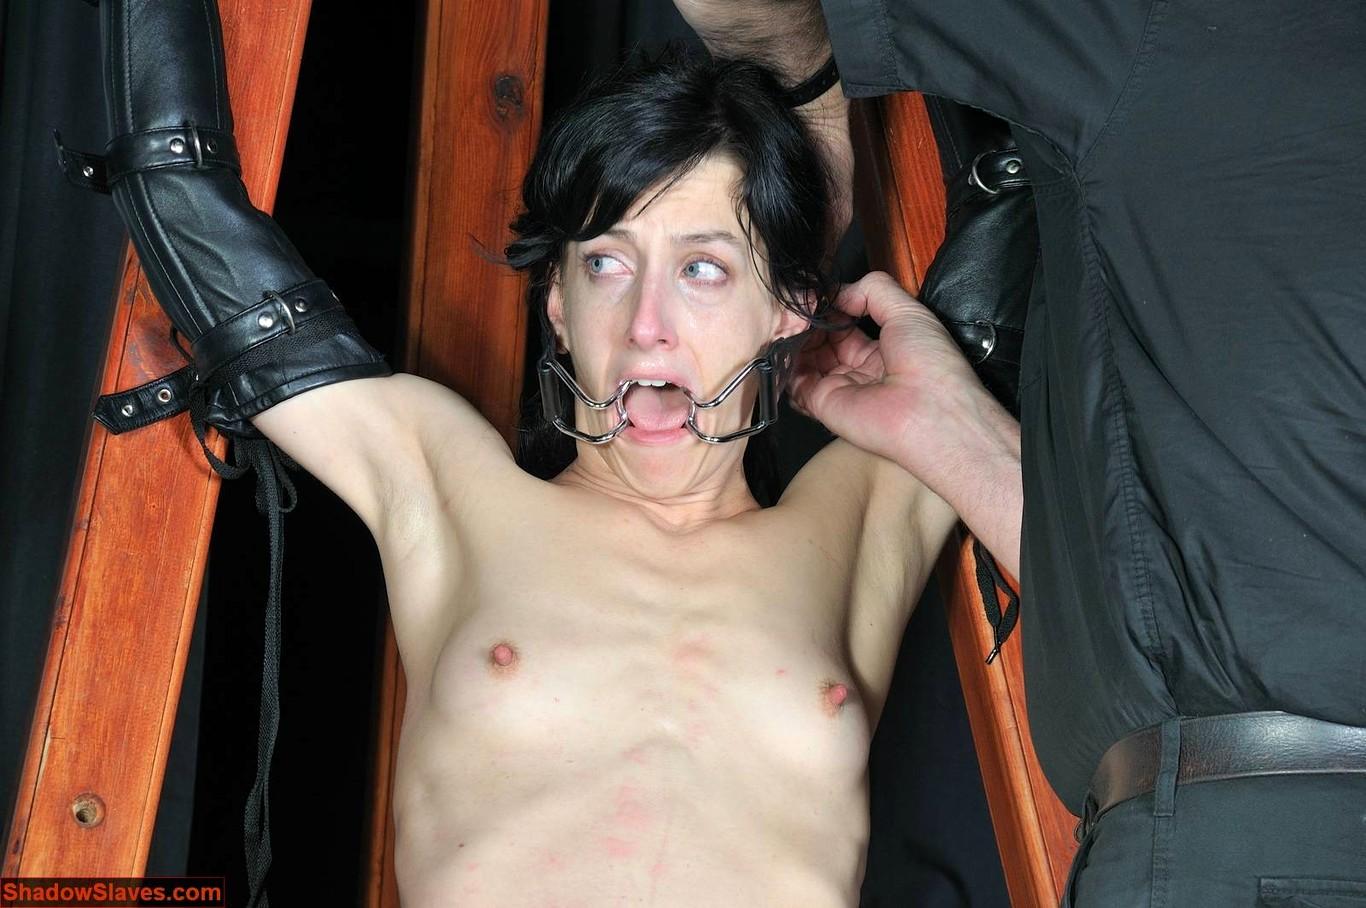 Mistress elise uk in public with slave apologise, but